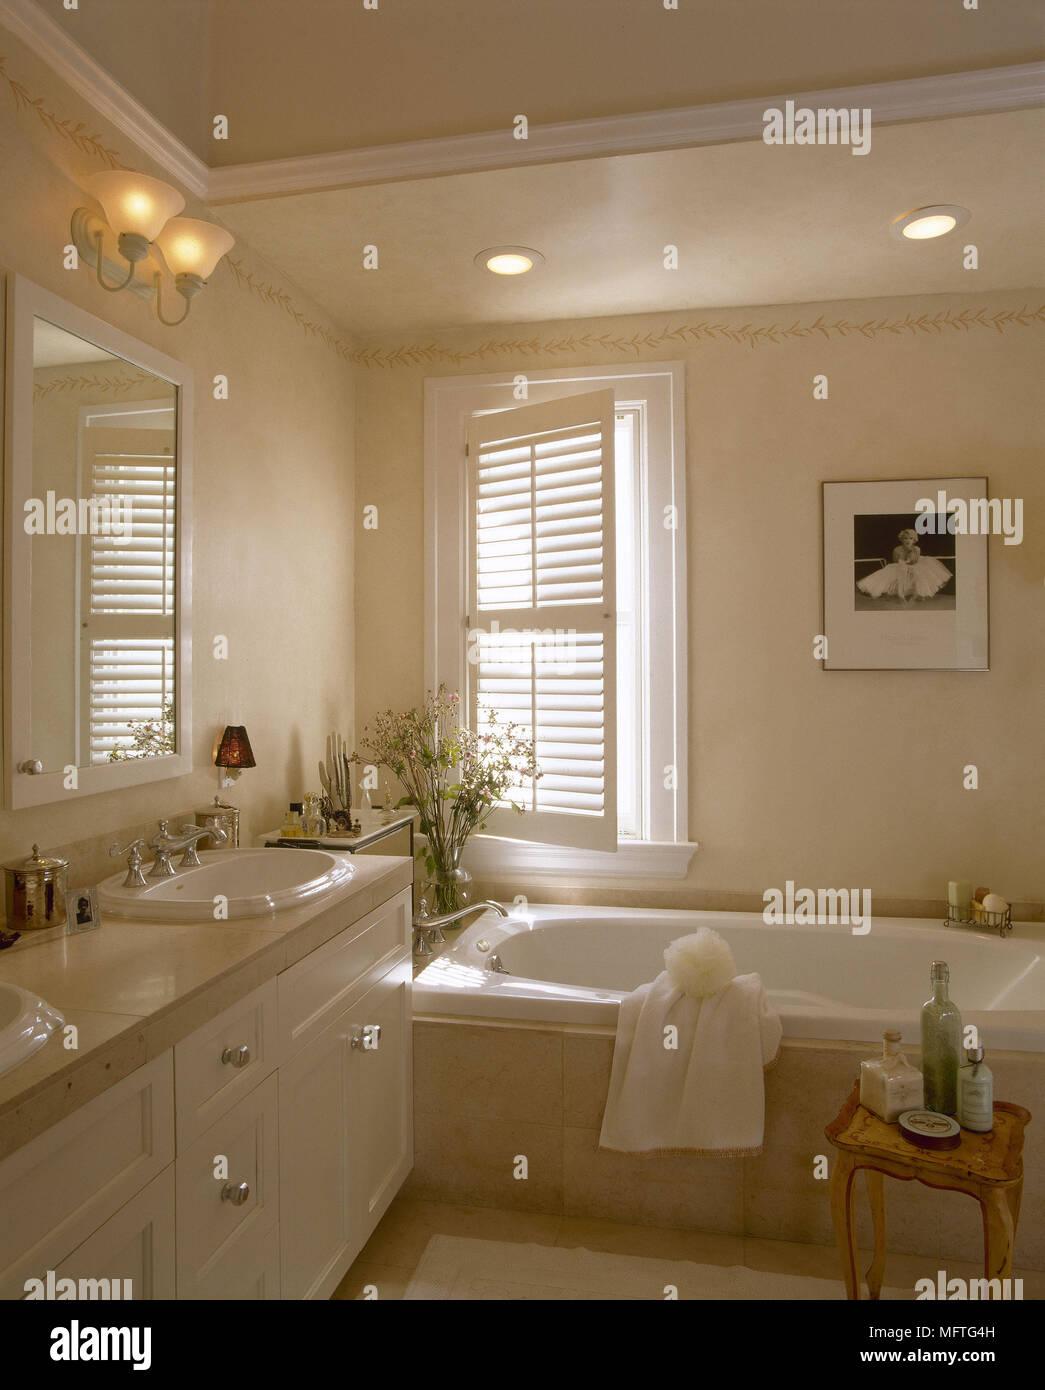 Twin Sinks Stock Photos & Twin Sinks Stock Images - Alamy